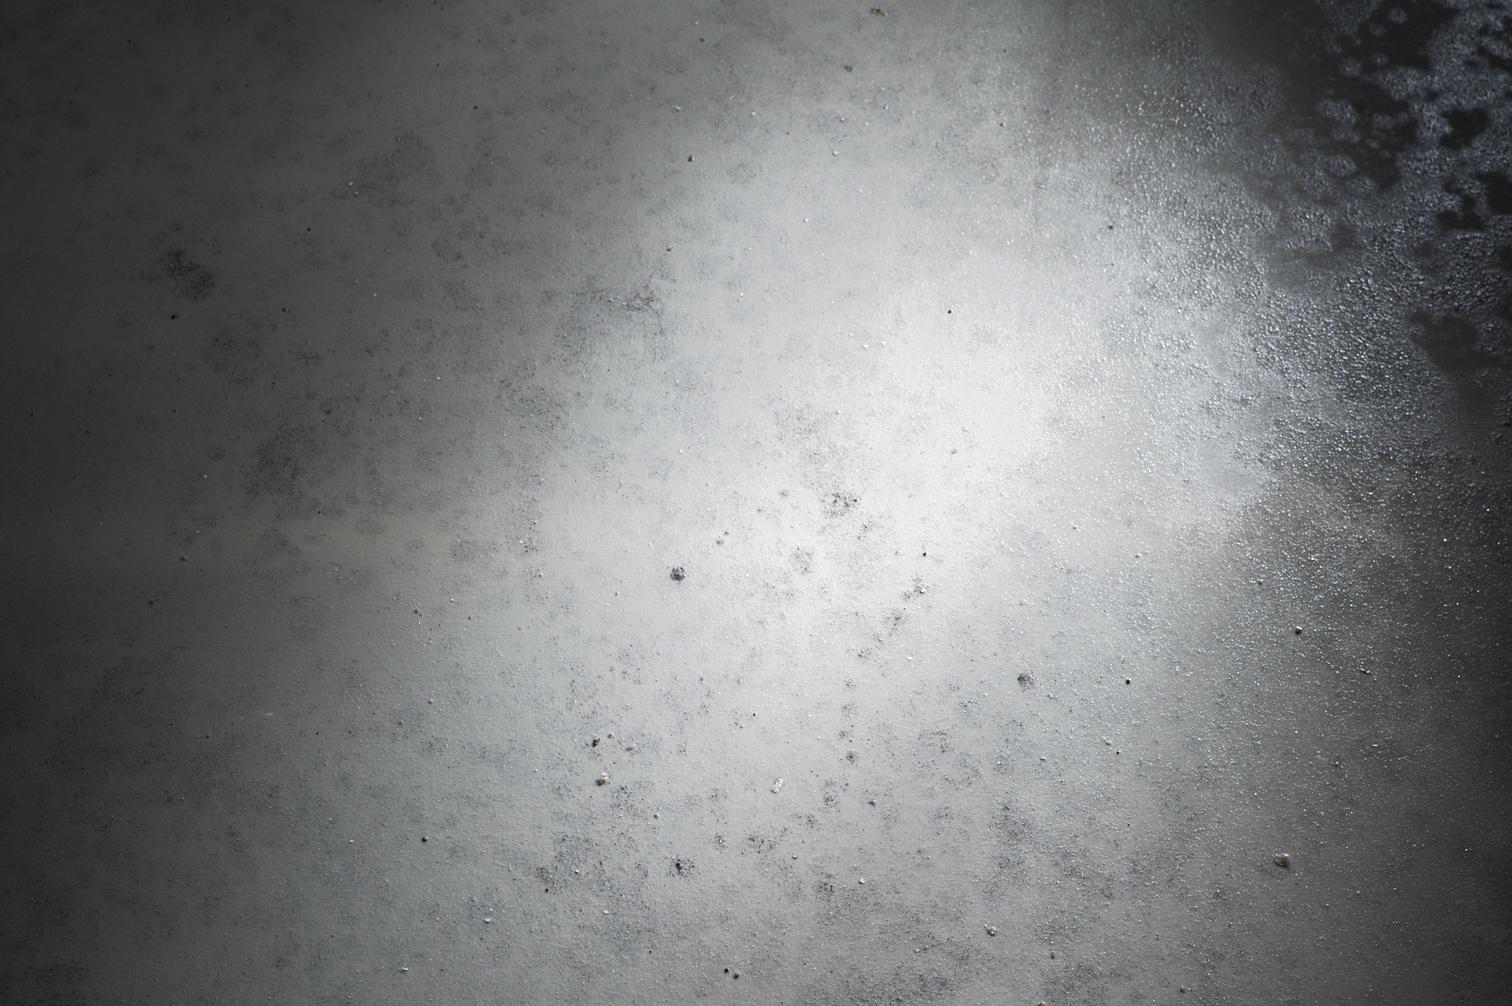 IlGattaRossa - 21 Mar 2015 - Ribalta - 08-DSC_0042